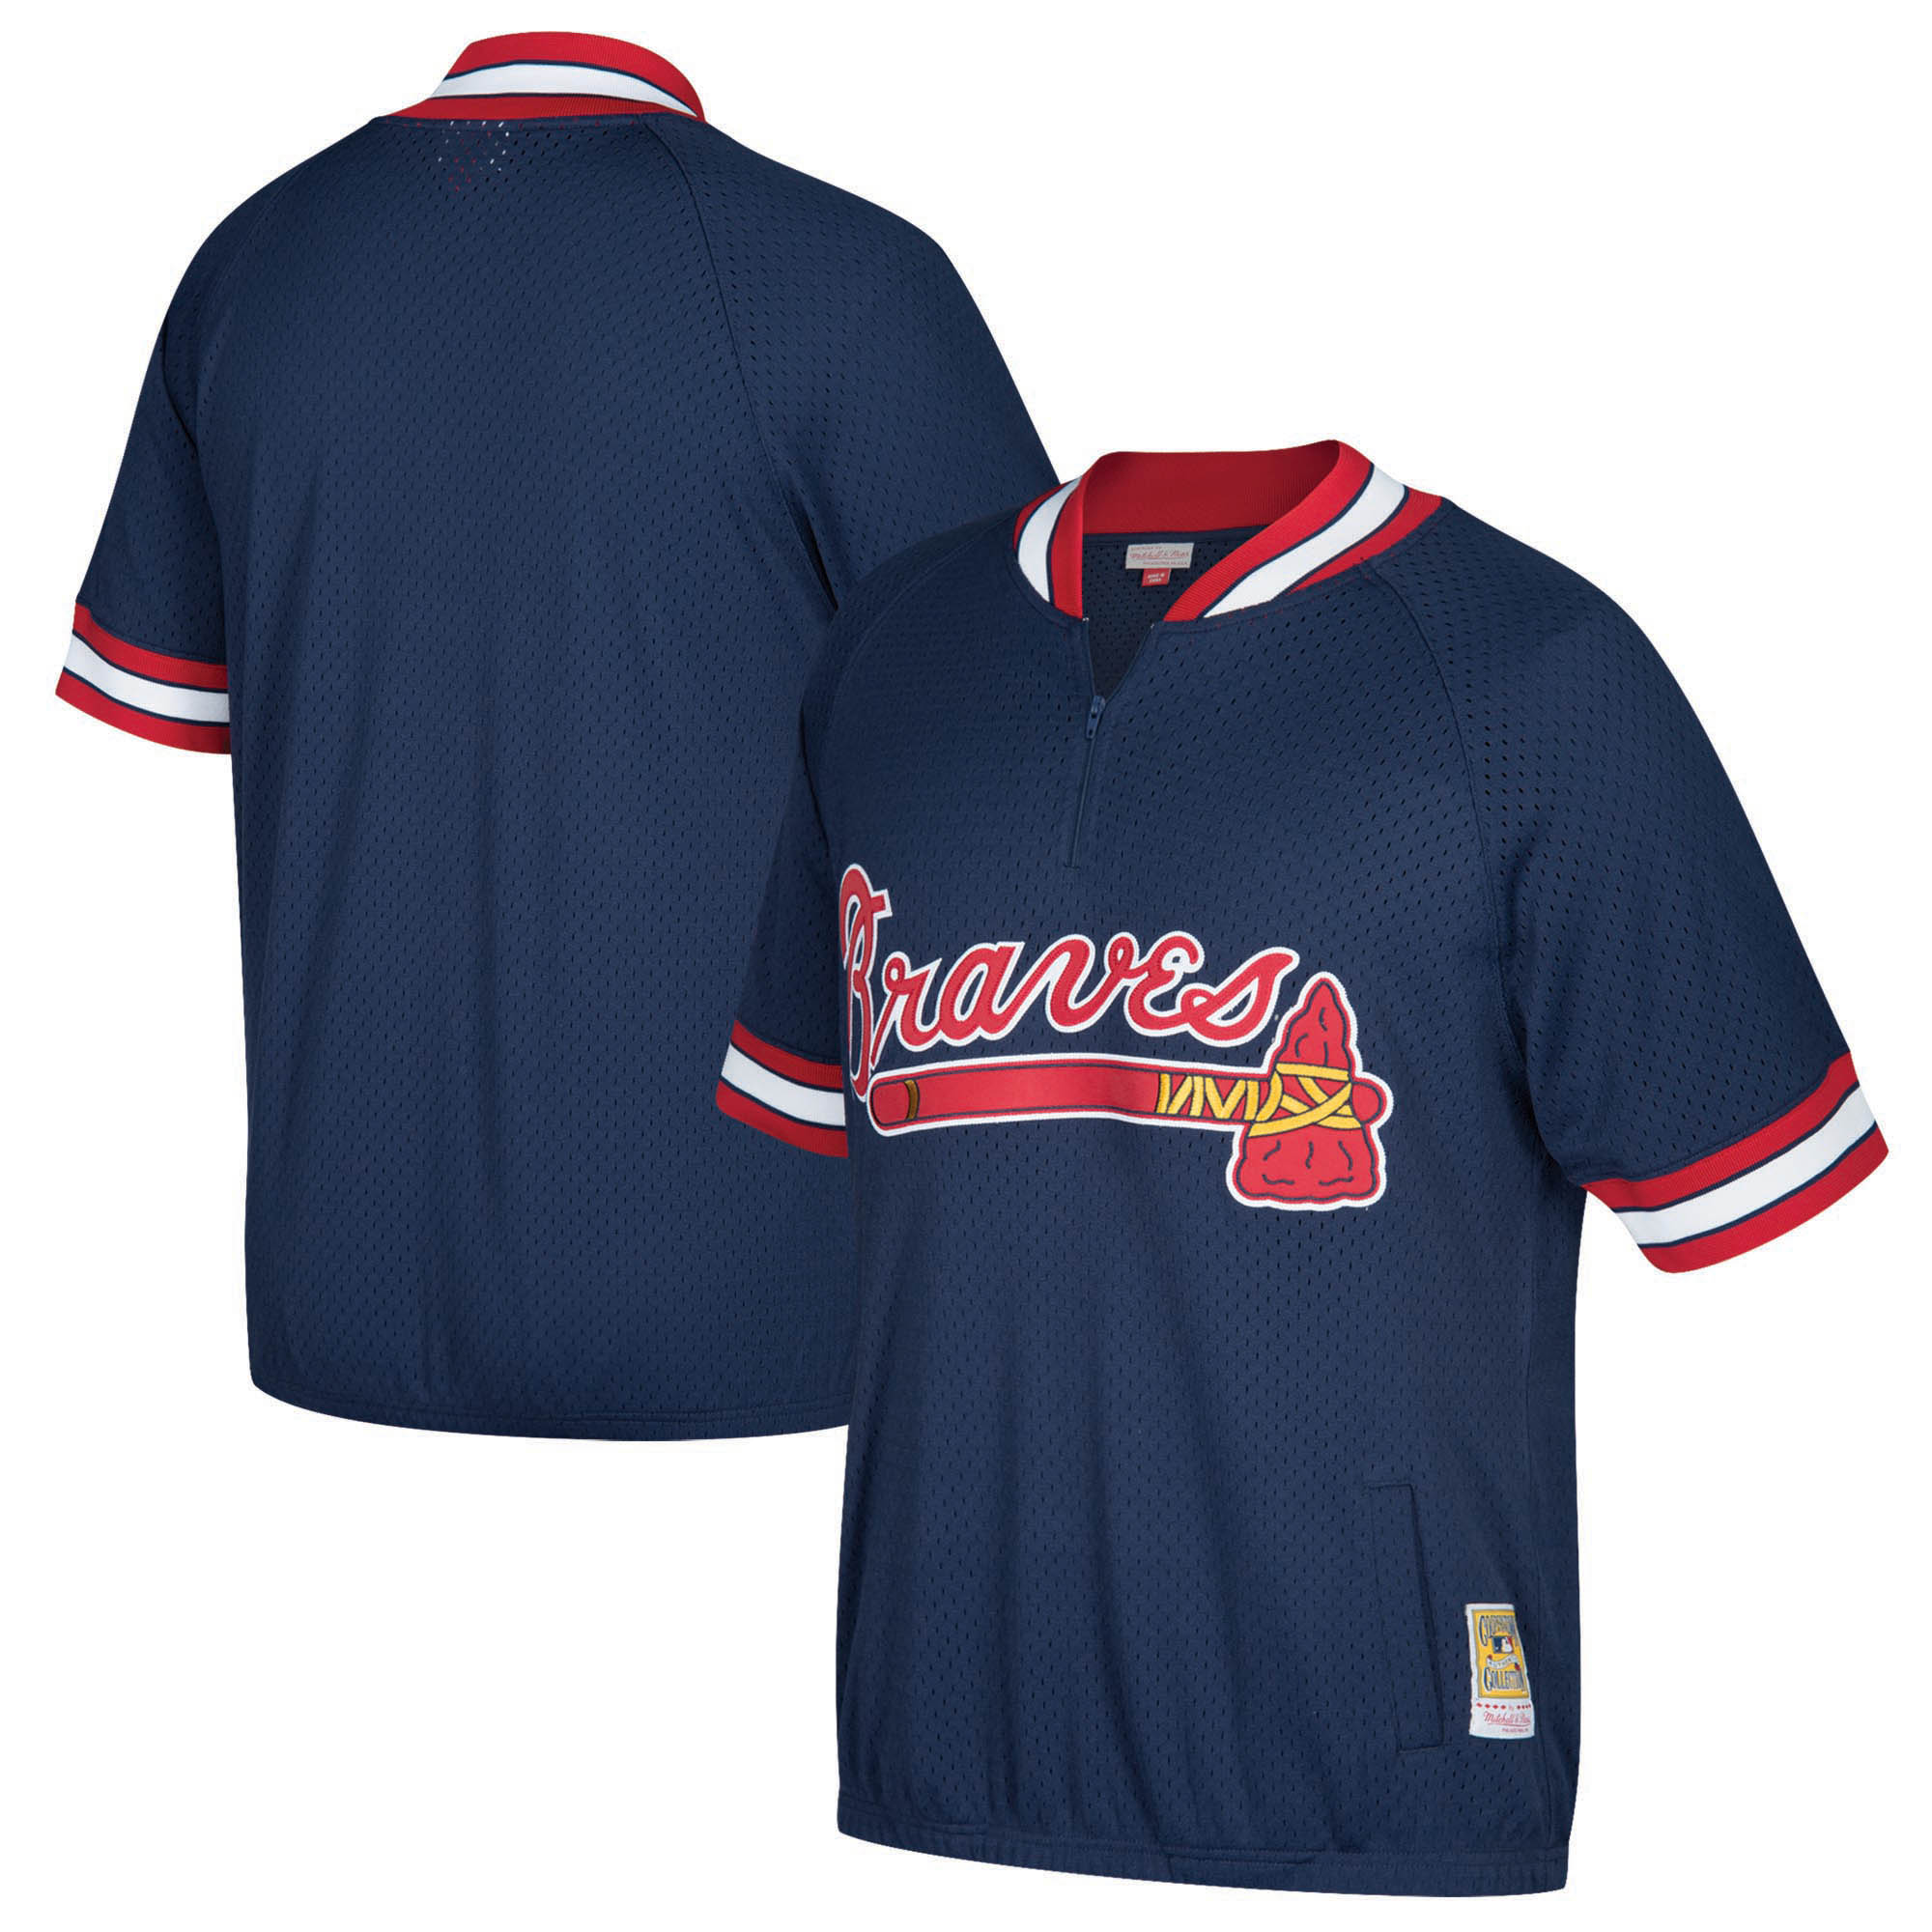 Atlanta Braves Mitchell & Ness Cooperstown Collection Mesh Batting Practice Quarter-Zip Jersey - Navy